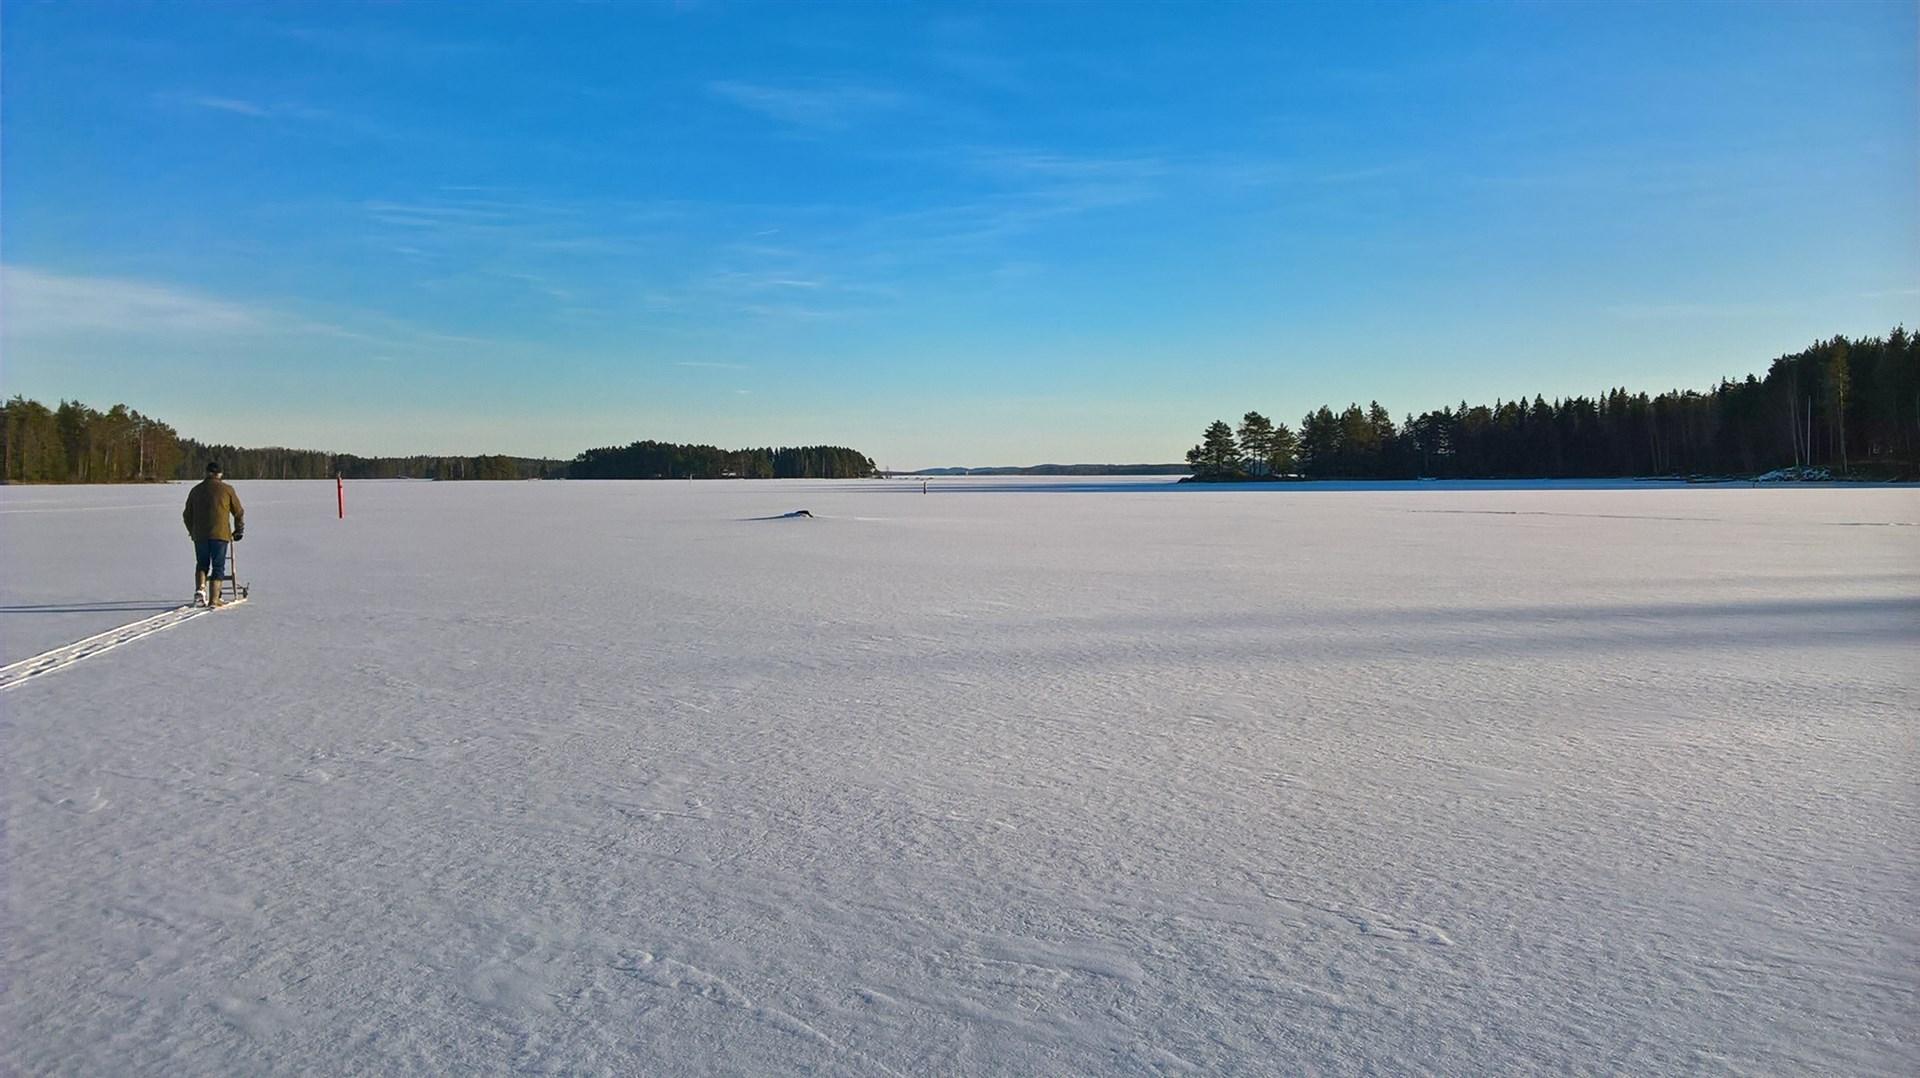 Vinter på sjön. (privat bild)